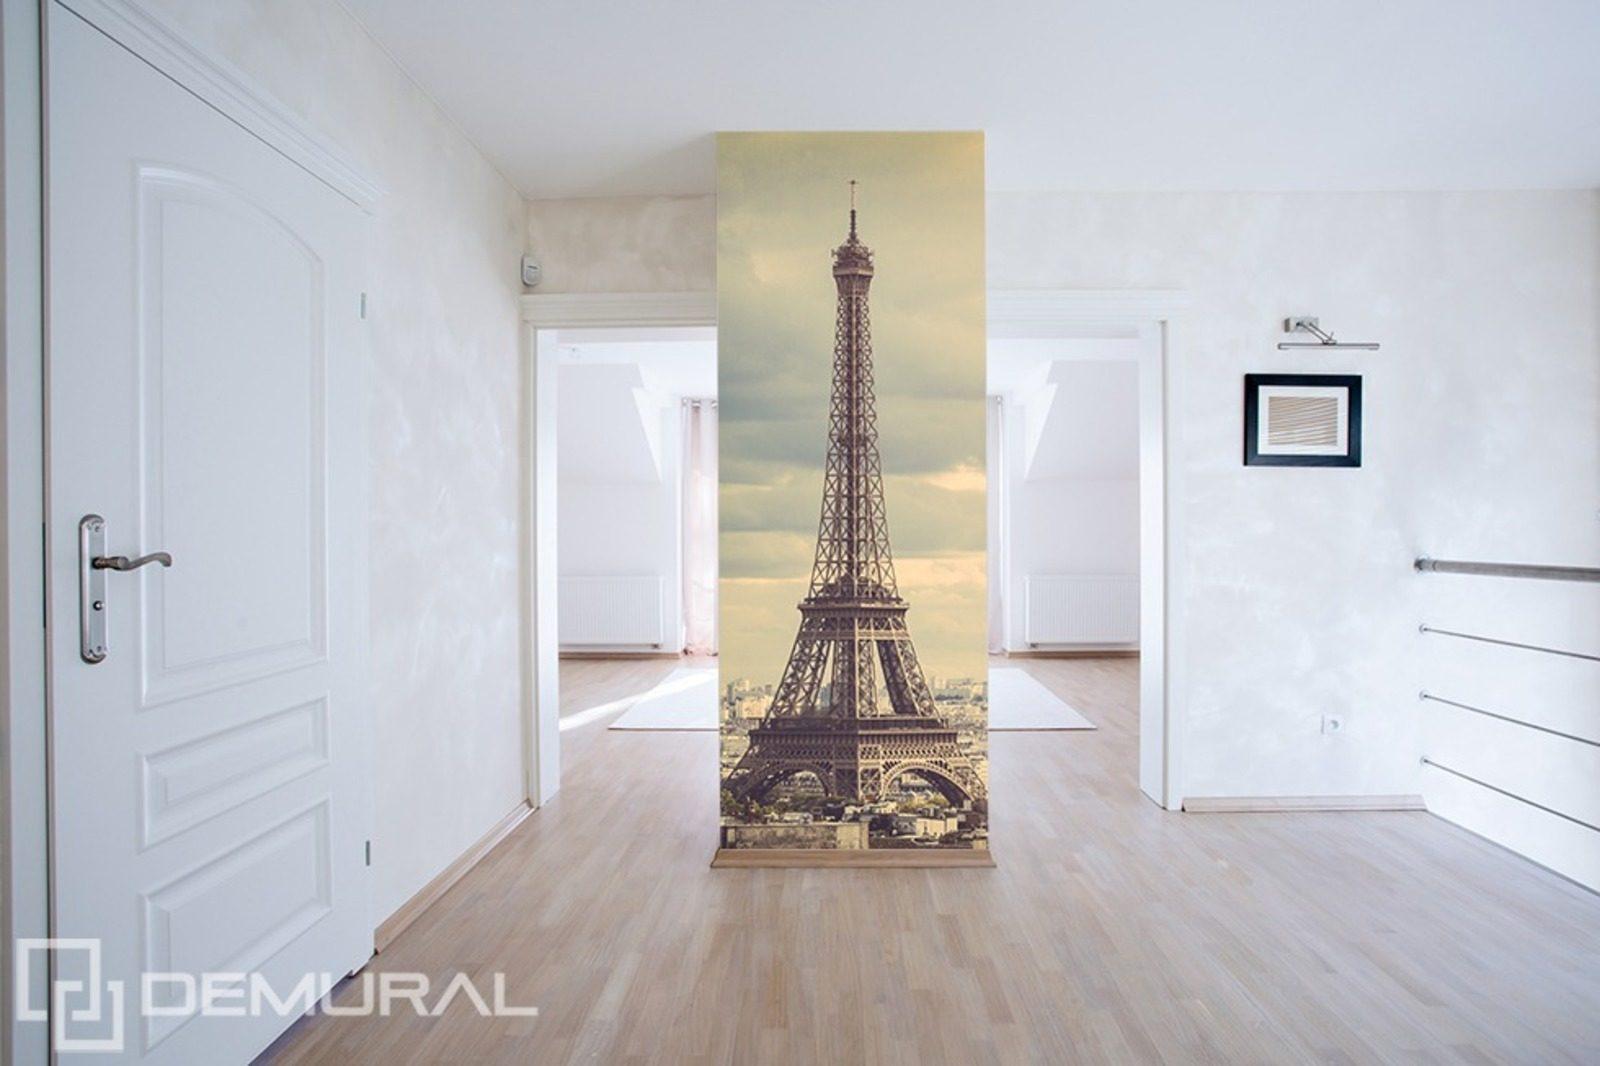 fototapete vlies paris tapete fototapeten f rs wohnzimmer fdb61 ebay. Black Bedroom Furniture Sets. Home Design Ideas